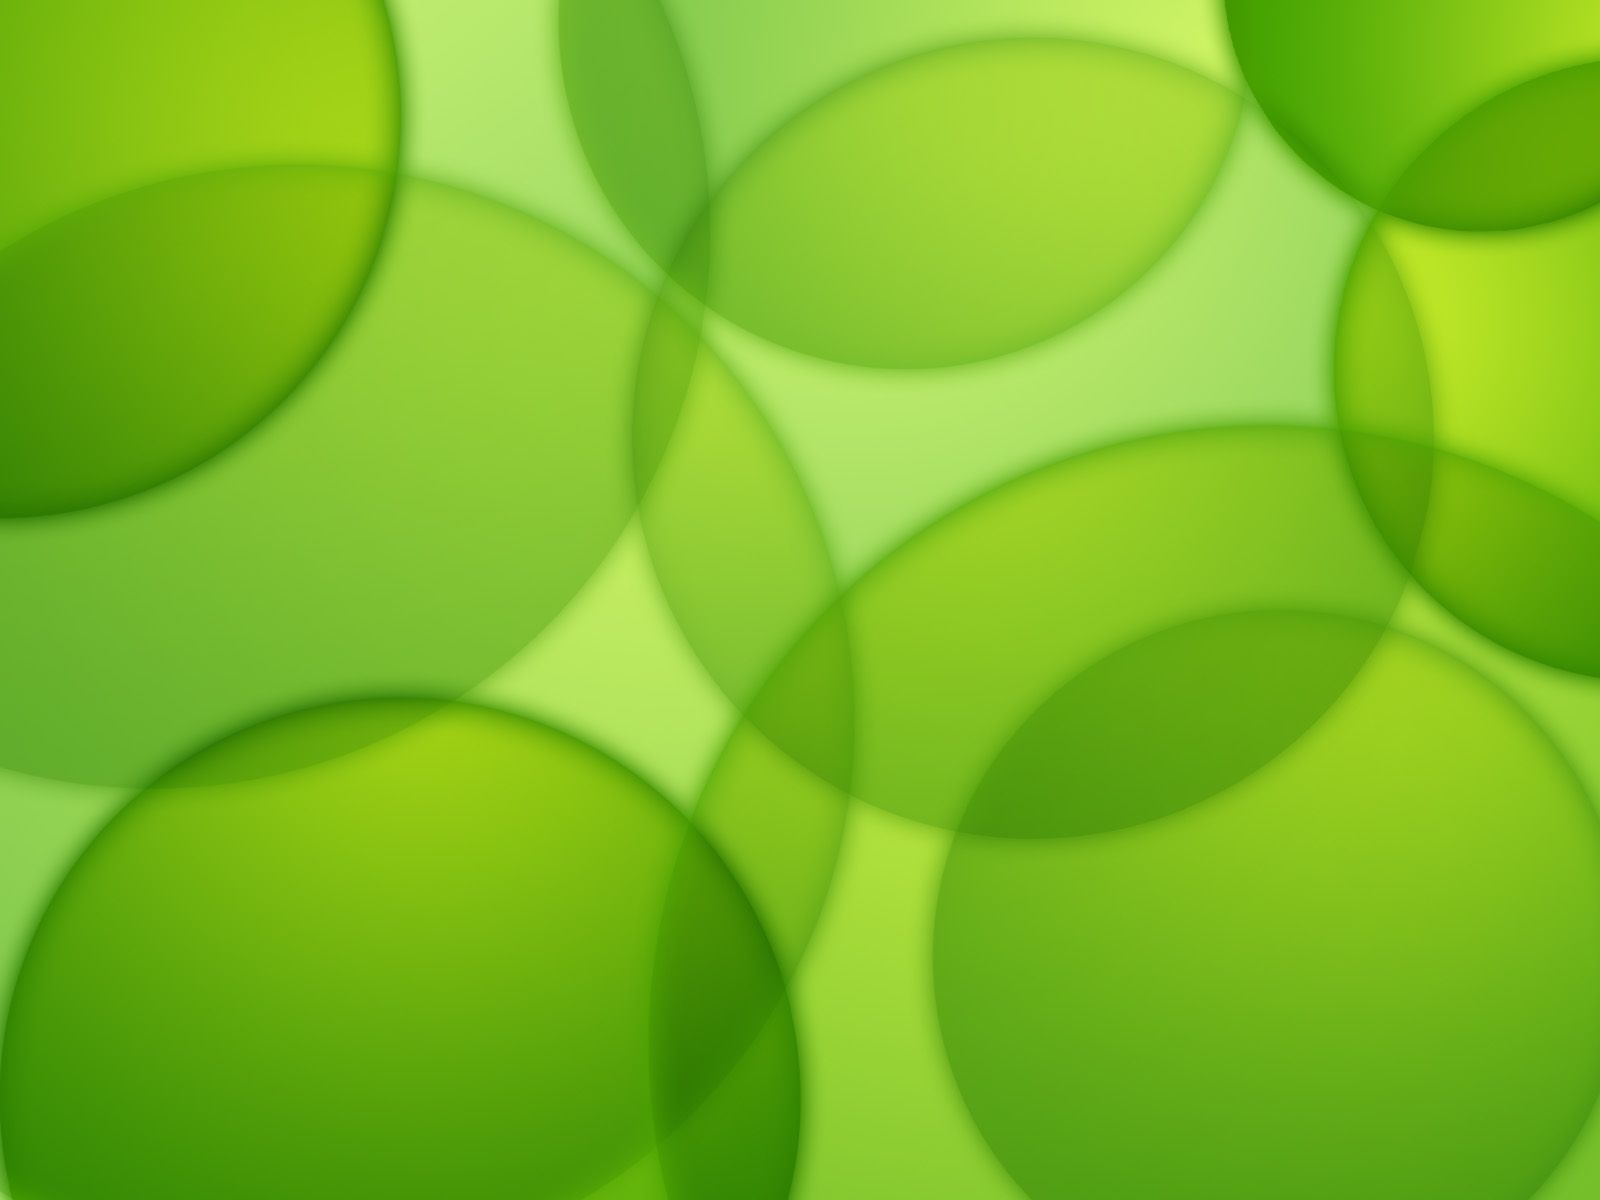 Big Green And Black Wallpaper 21 High Resolution Wallpaper